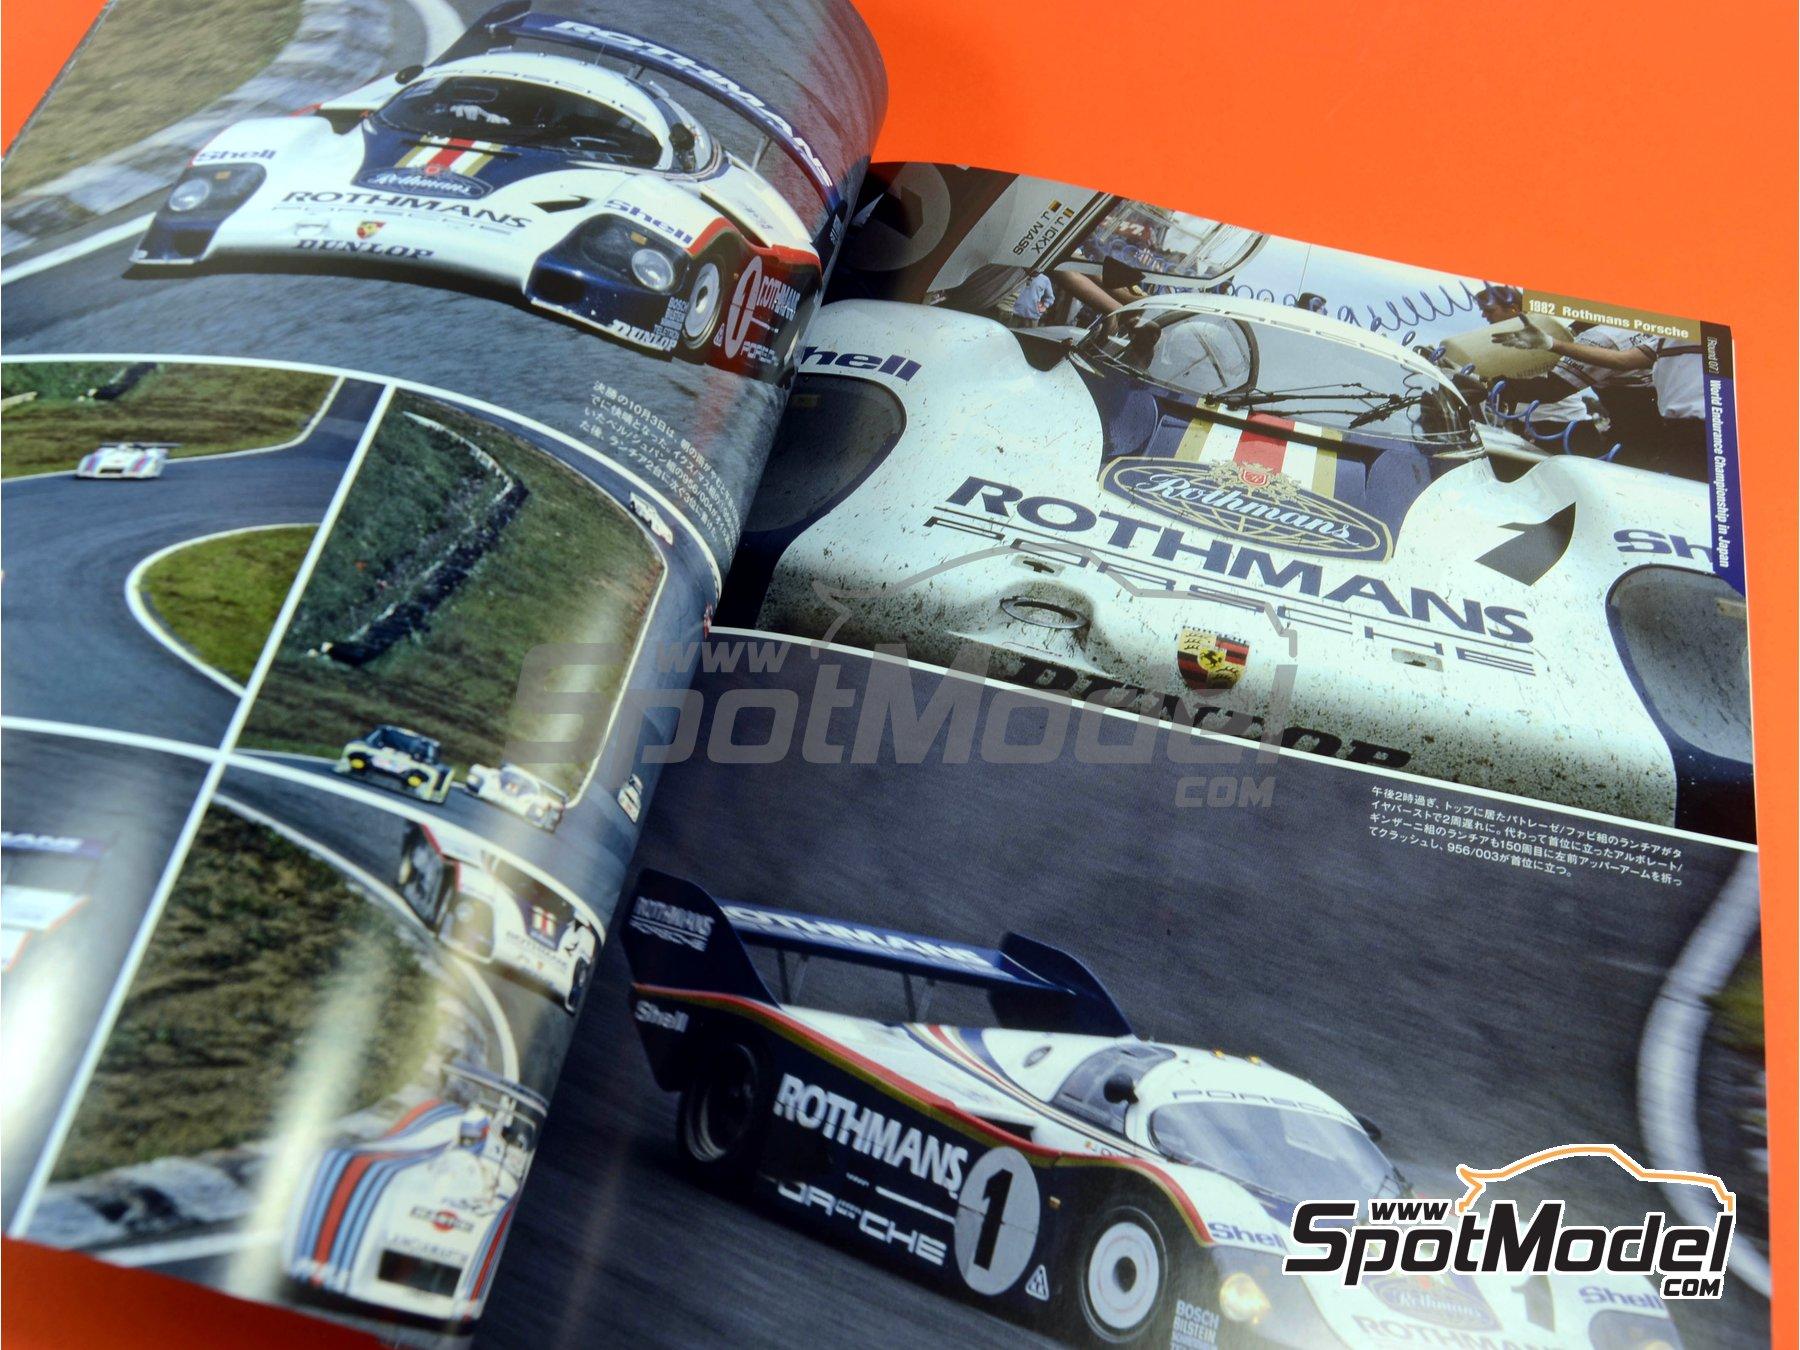 Image 4: Joe Honda Sportscar Spectacles - Porsche 956 - 24 Horas de Le Mans, 1000 Kilómetros de Suzuka, 6 Horas de Silverstone, 6 Horas de Fuji 1982, 1983, 1984, 1985 y 1985 | Libro de referencia fabricado por Model Factory Hiro (ref.MFH-SS007)